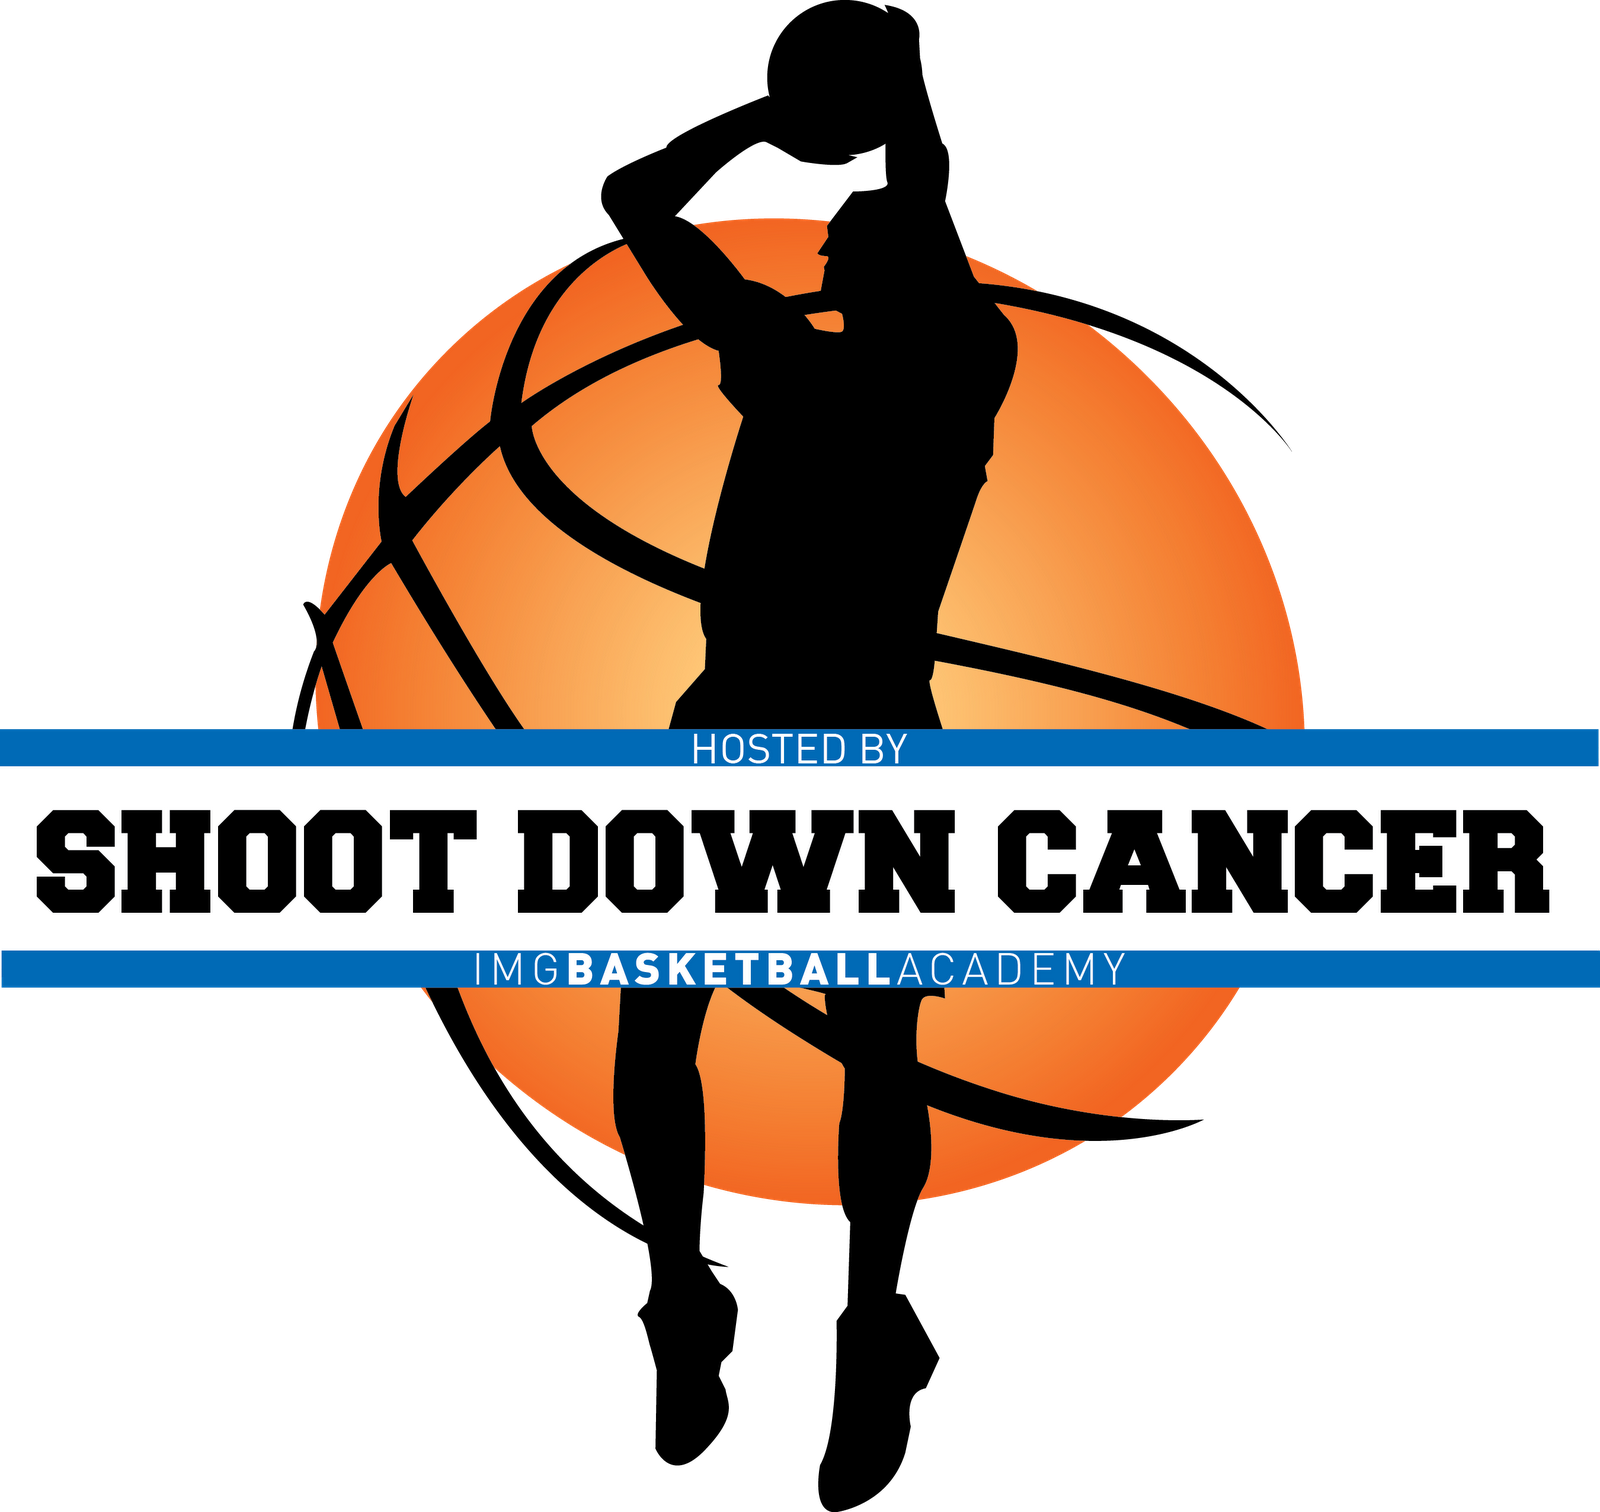 sportszooms gallery gambar 10 logo logo bola basket free monkey clip art images free monkey clip art downloads